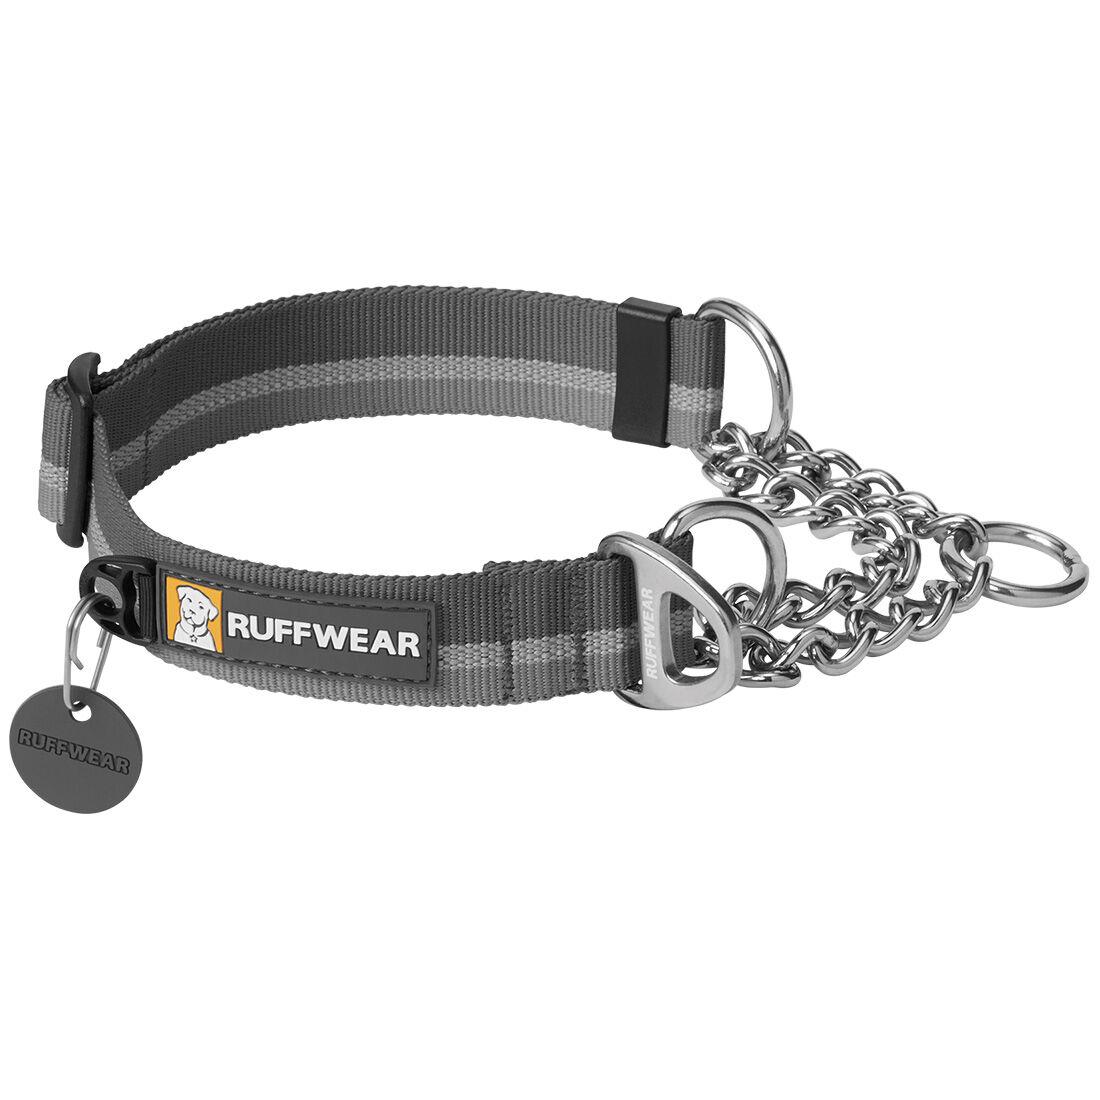 Ruffwear Collier pour chien Ruffwear Chain Reaction gris Taille : M